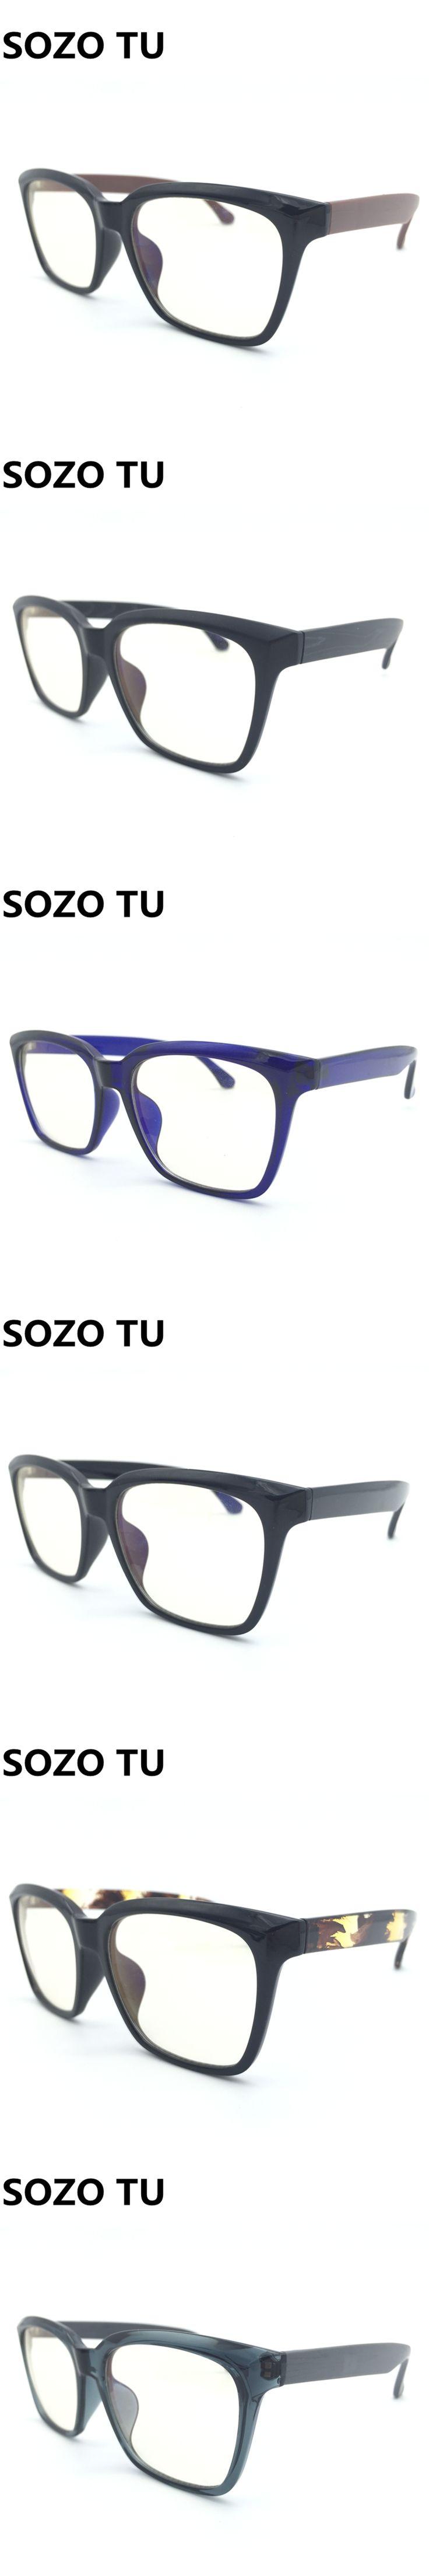 Anti Blue Light Blocking Fashion Women Glasses Frame Men Eyeglasses Frame Vintage Round Eyeglasses Brand Designer TR90 27055